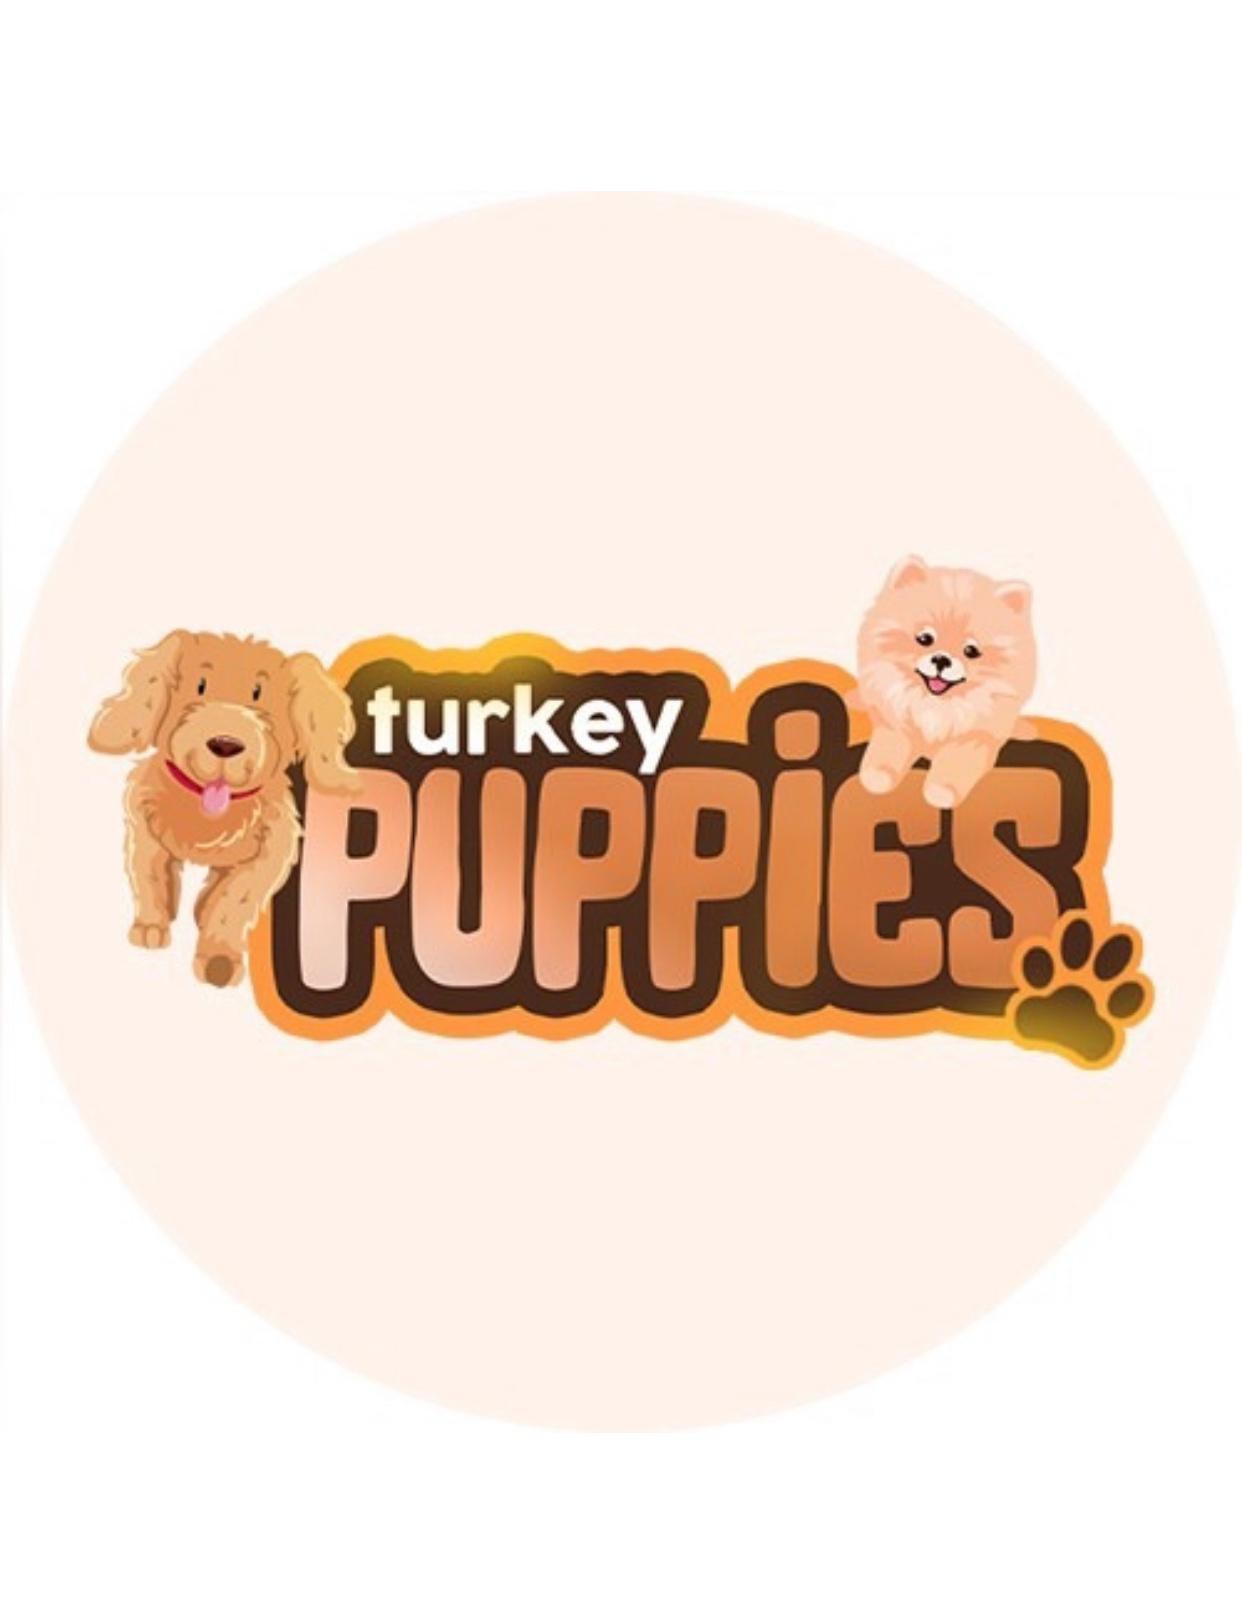 turkeypuppies